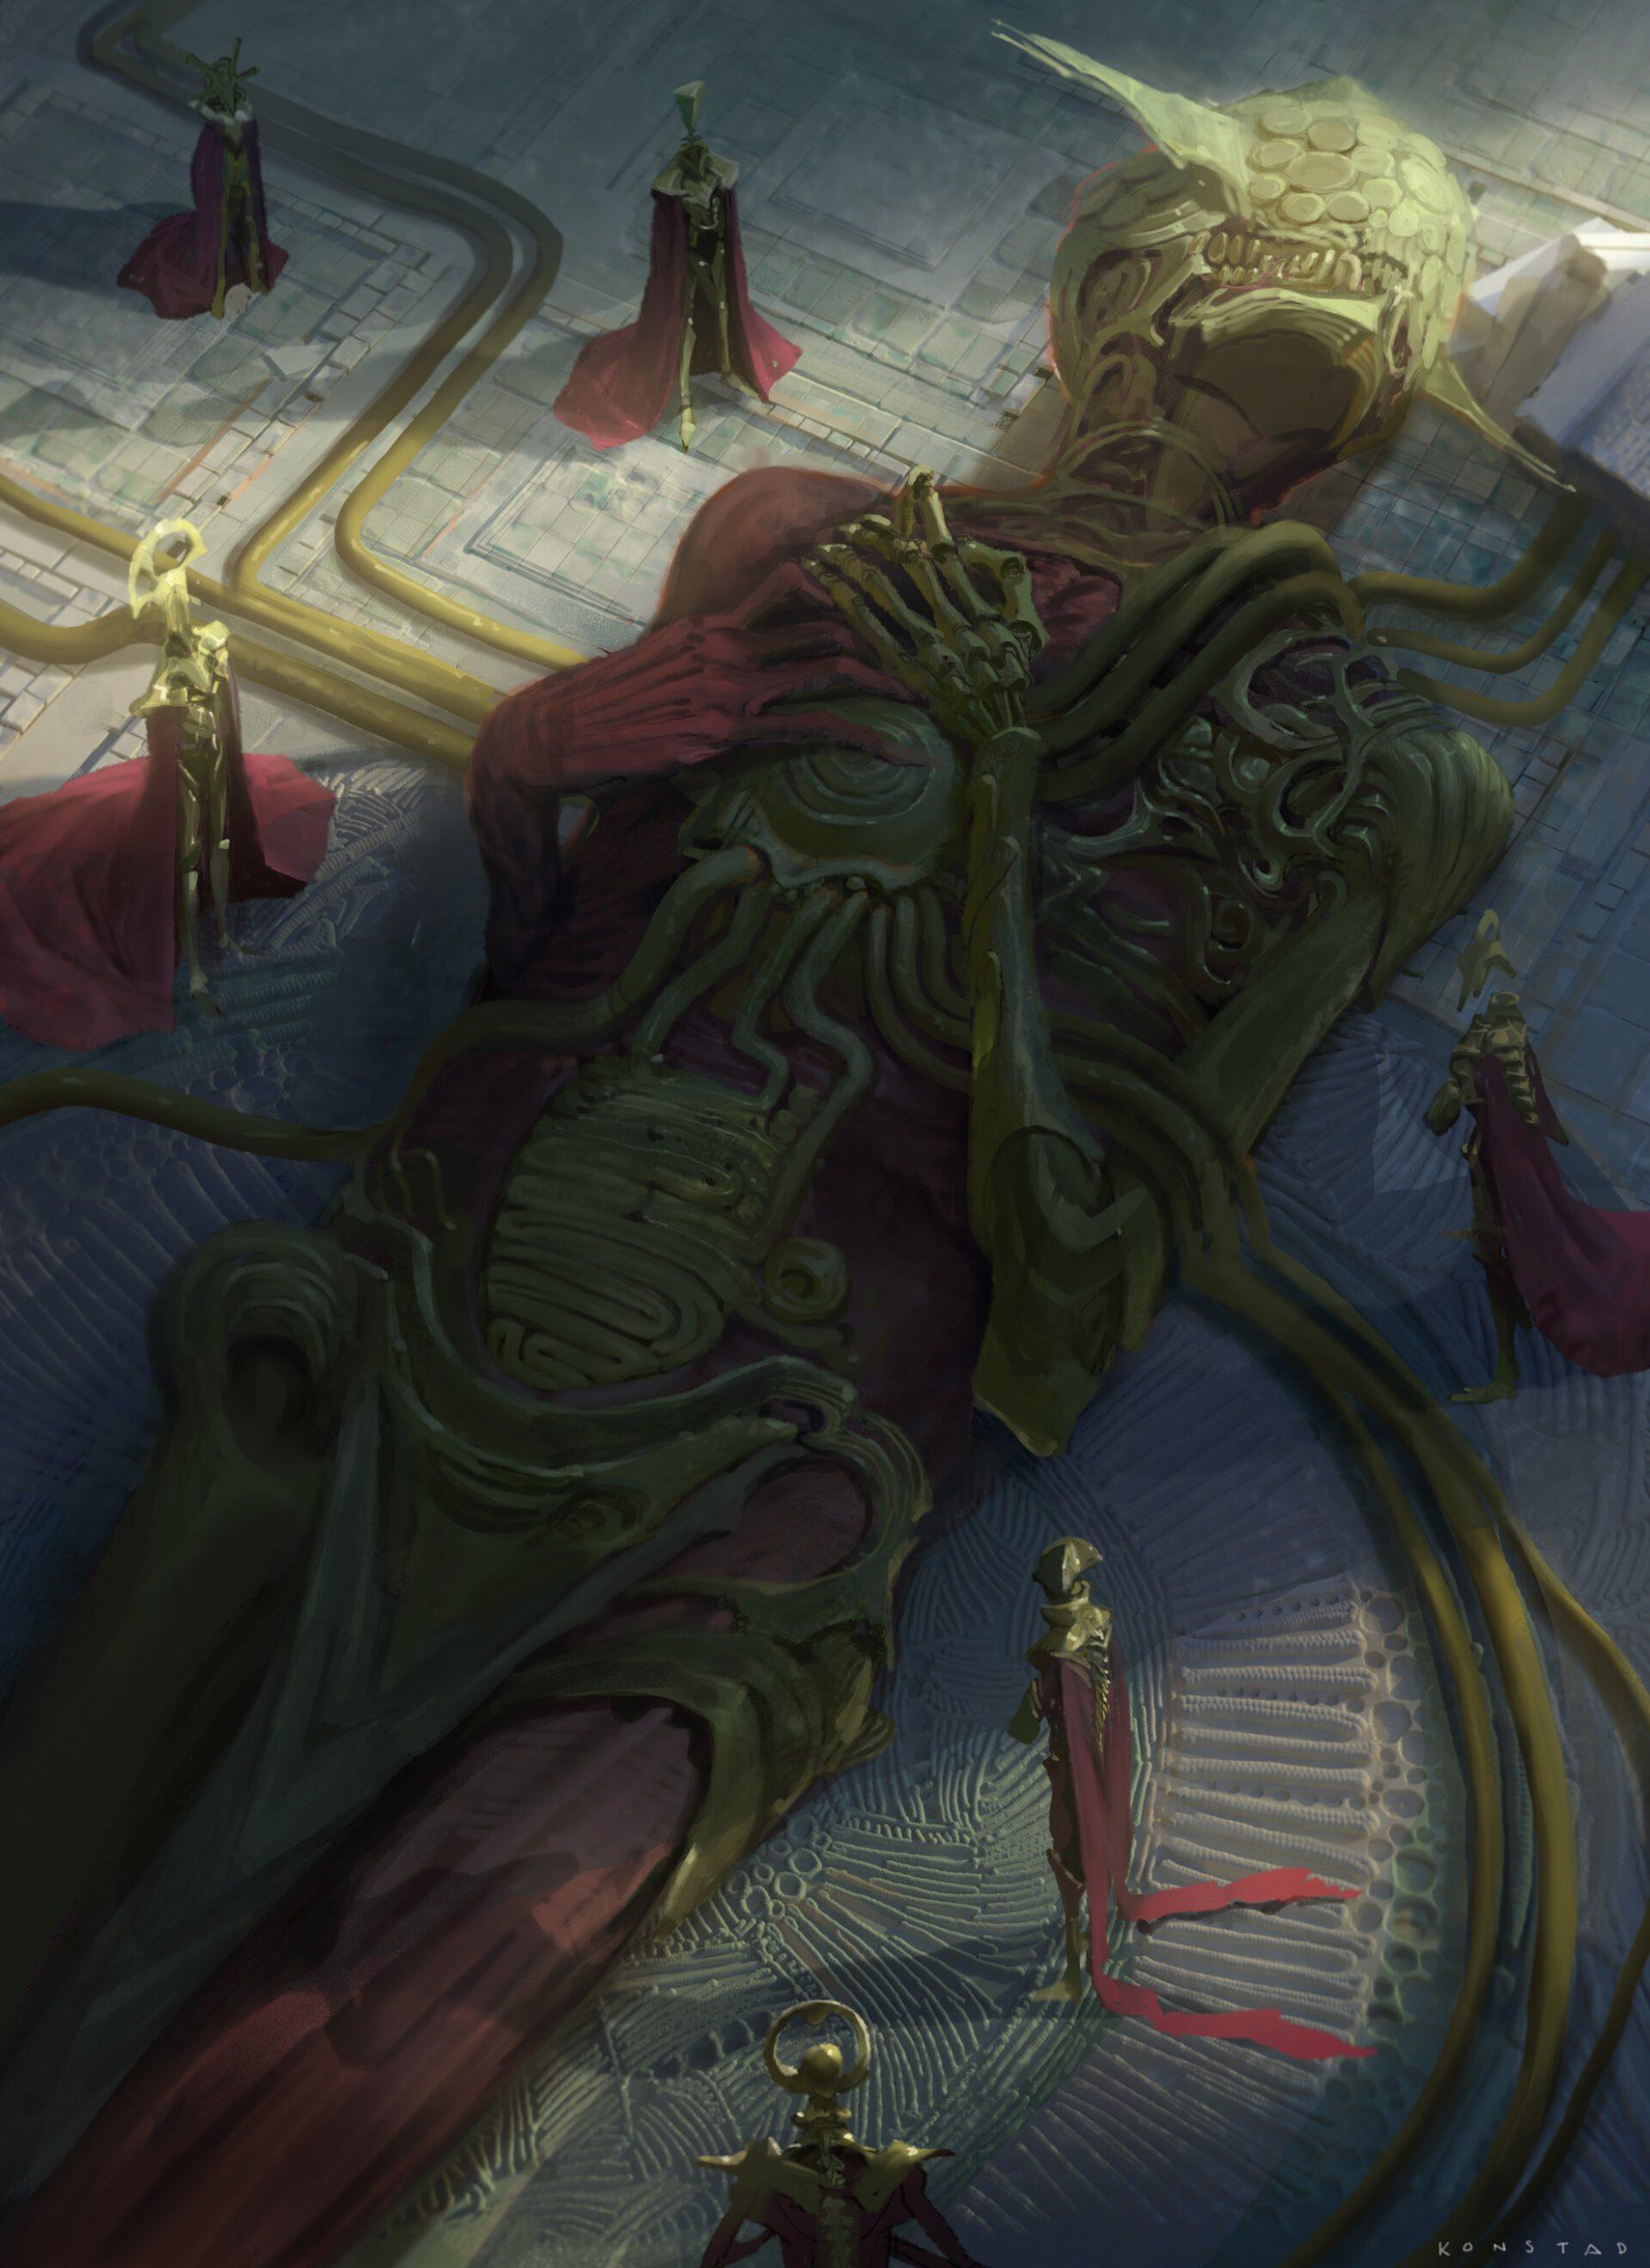 The Amazing Fantasy Artworks of Alex Konstad